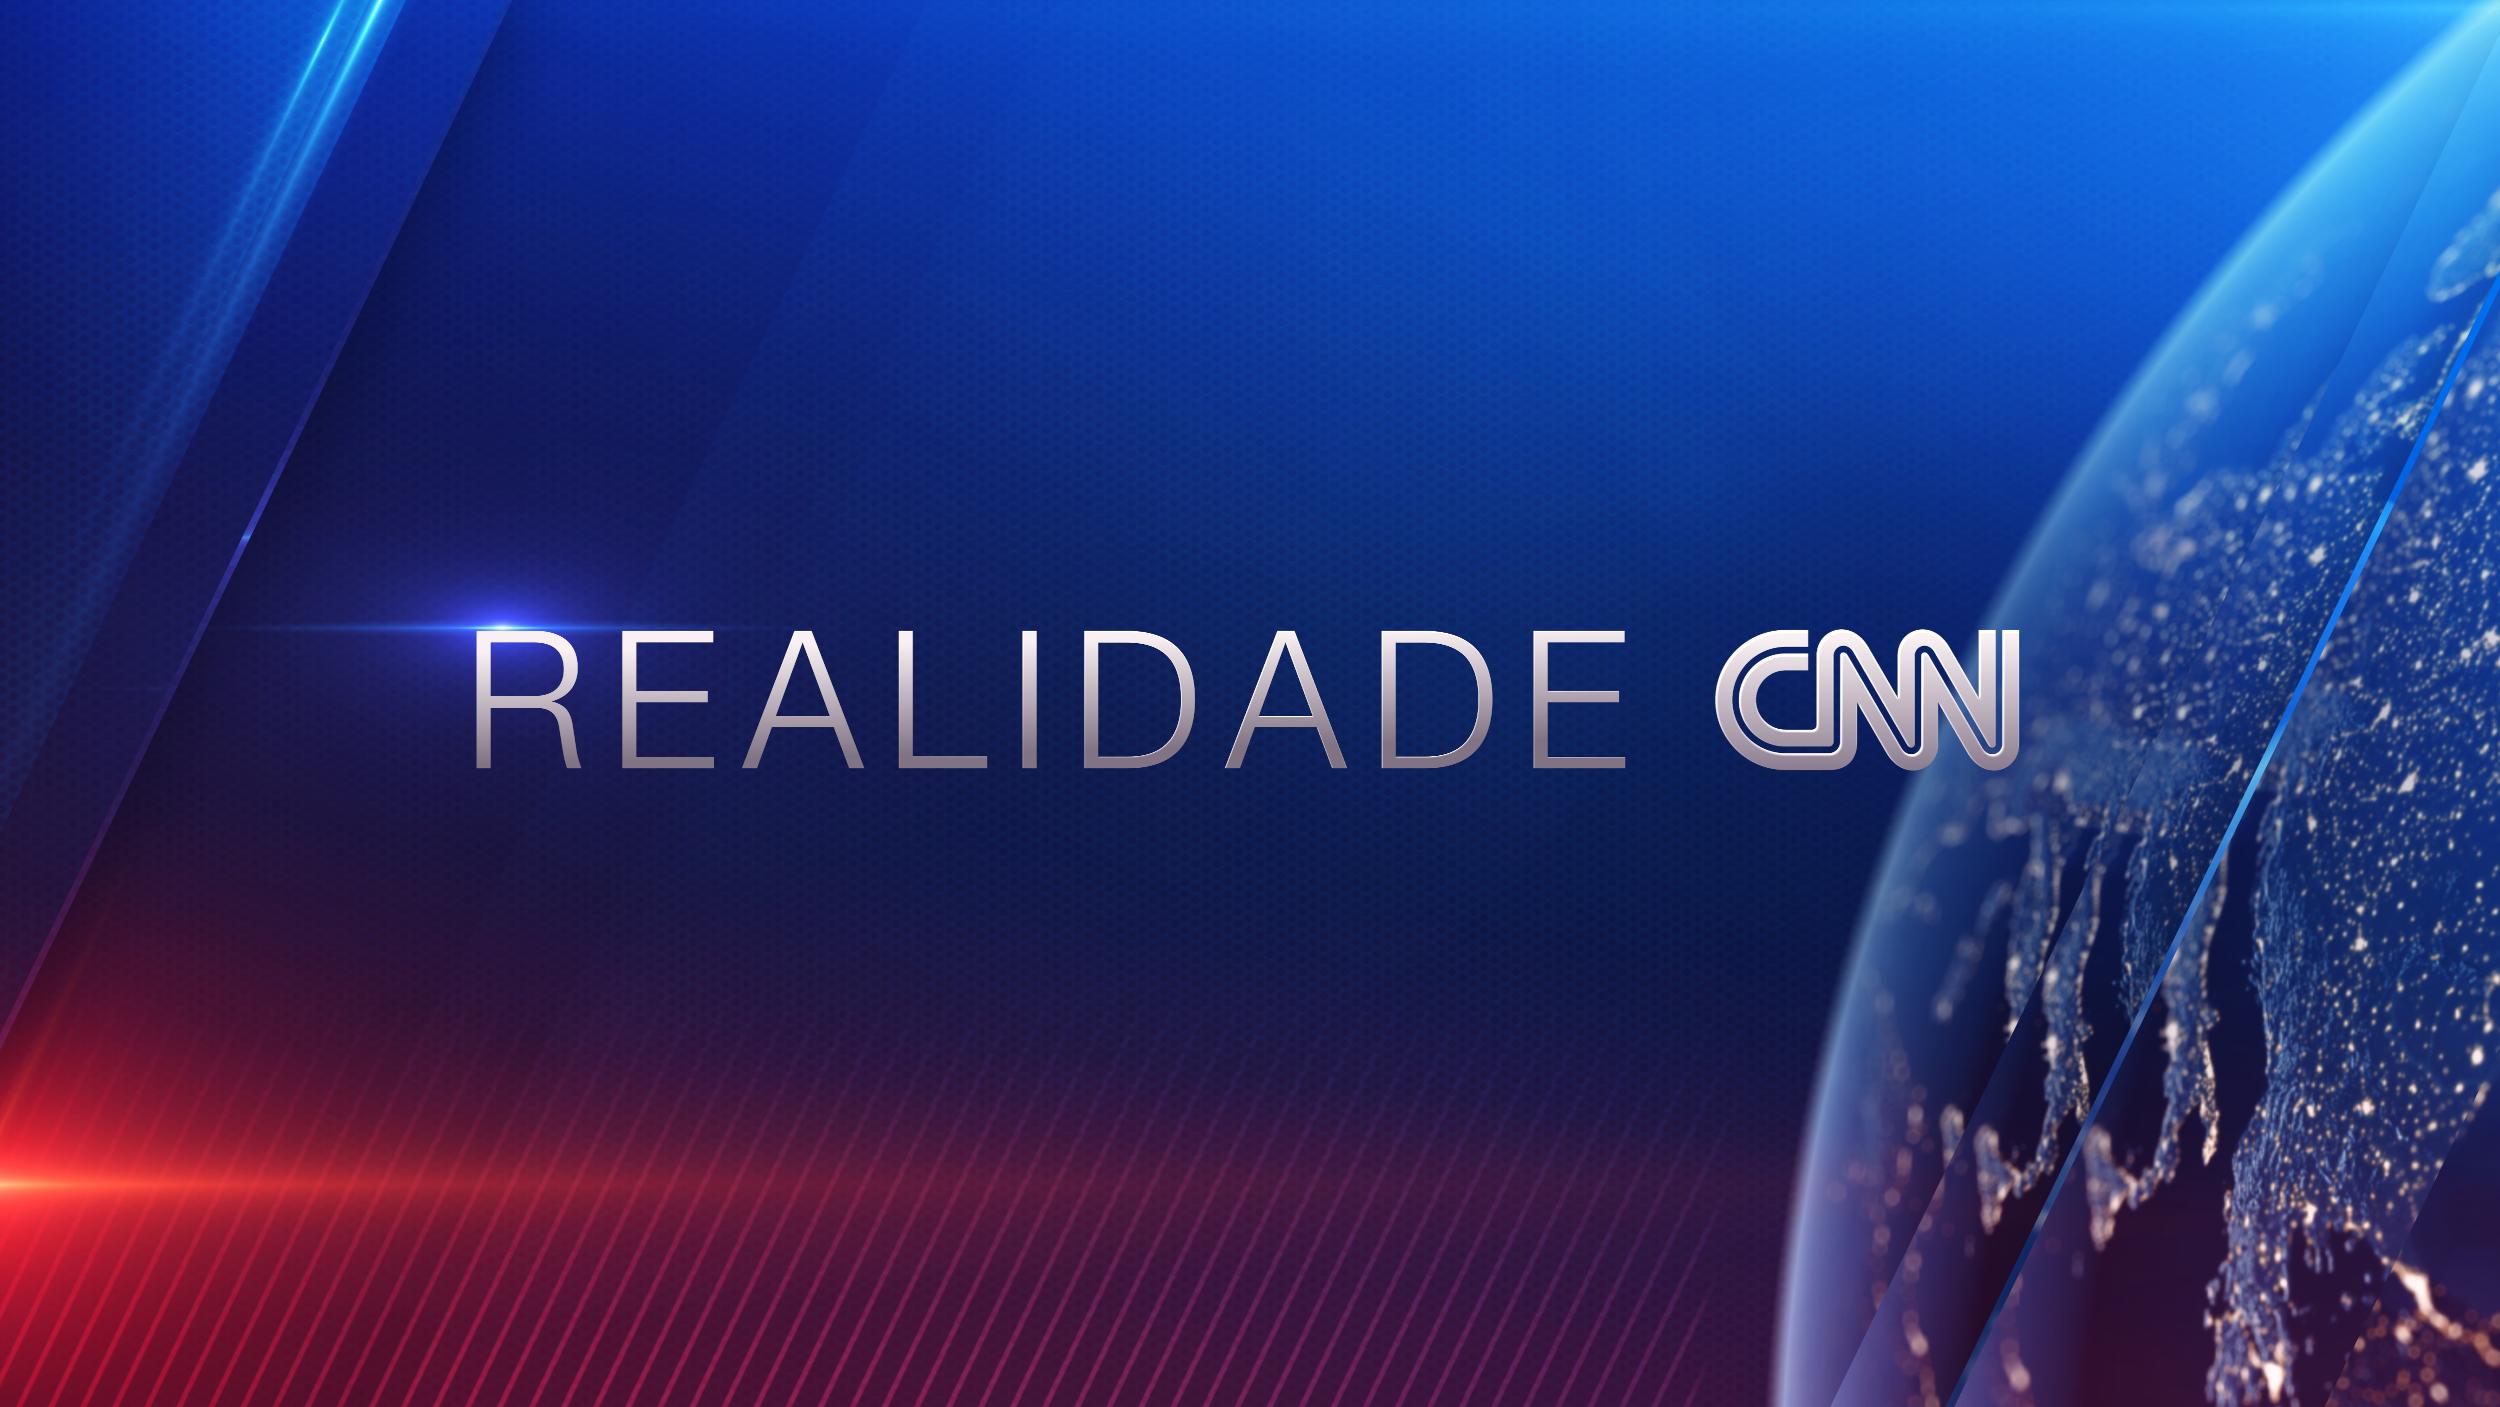 Realidade CNN